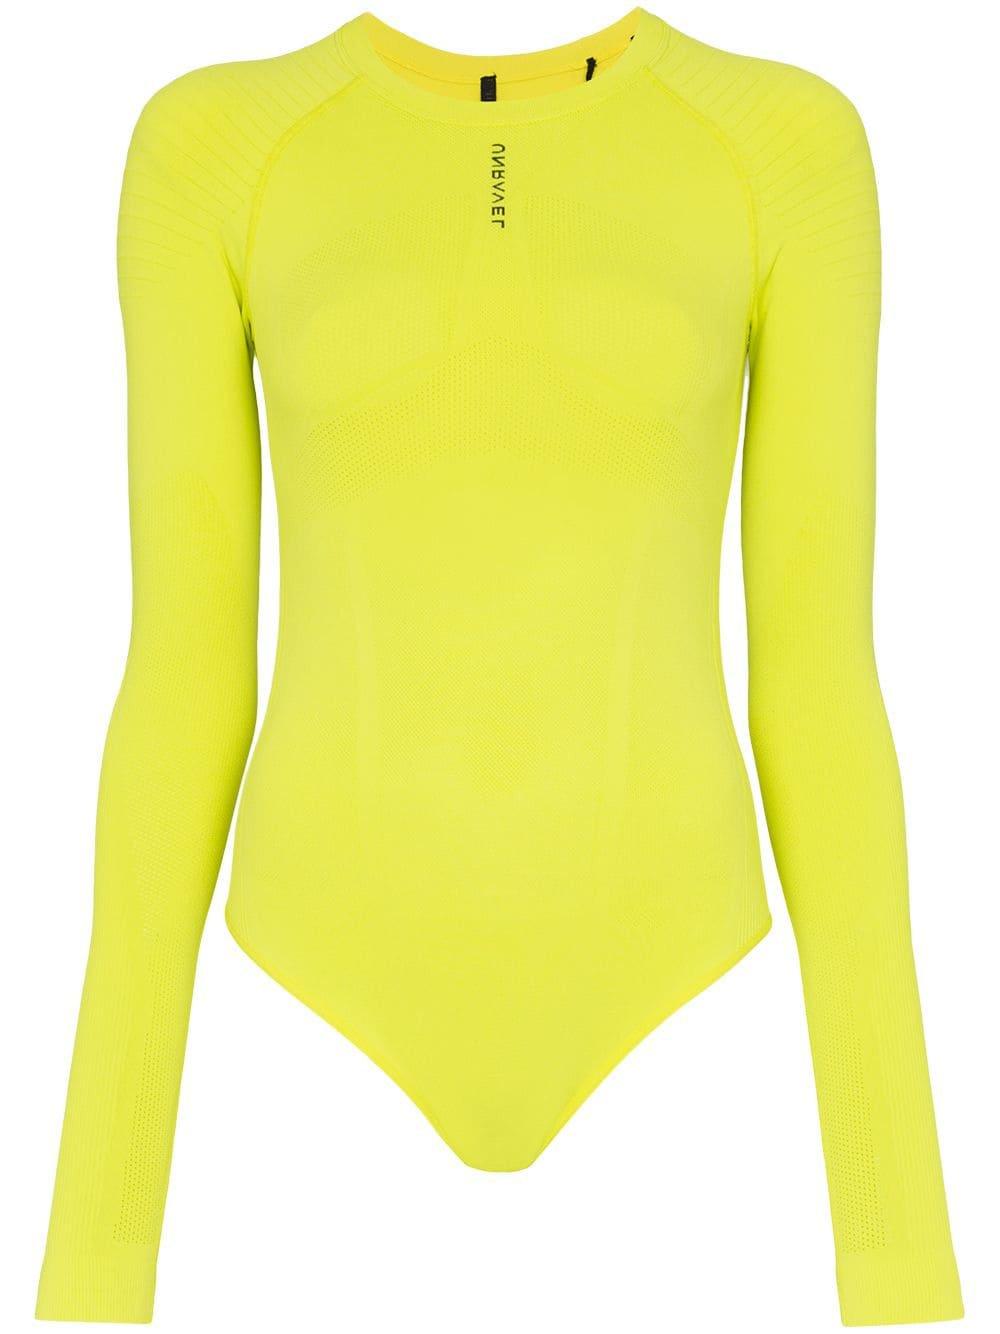 Unravel Project seamless tech bodysuit